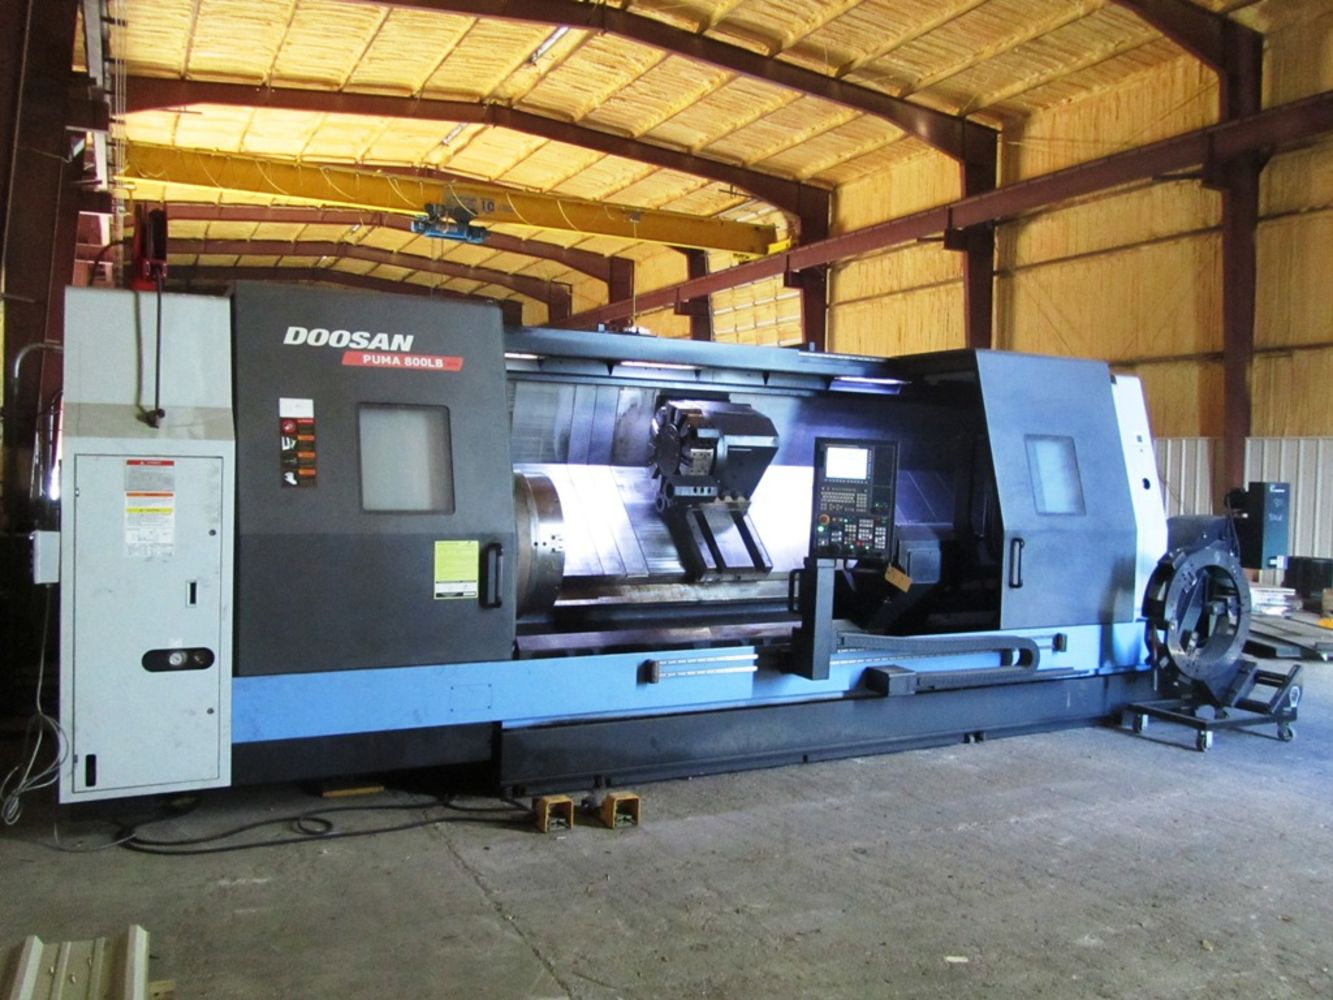 REVOLUTION MACHINE - Doosan CNC Turning & Vertical Machining Centers